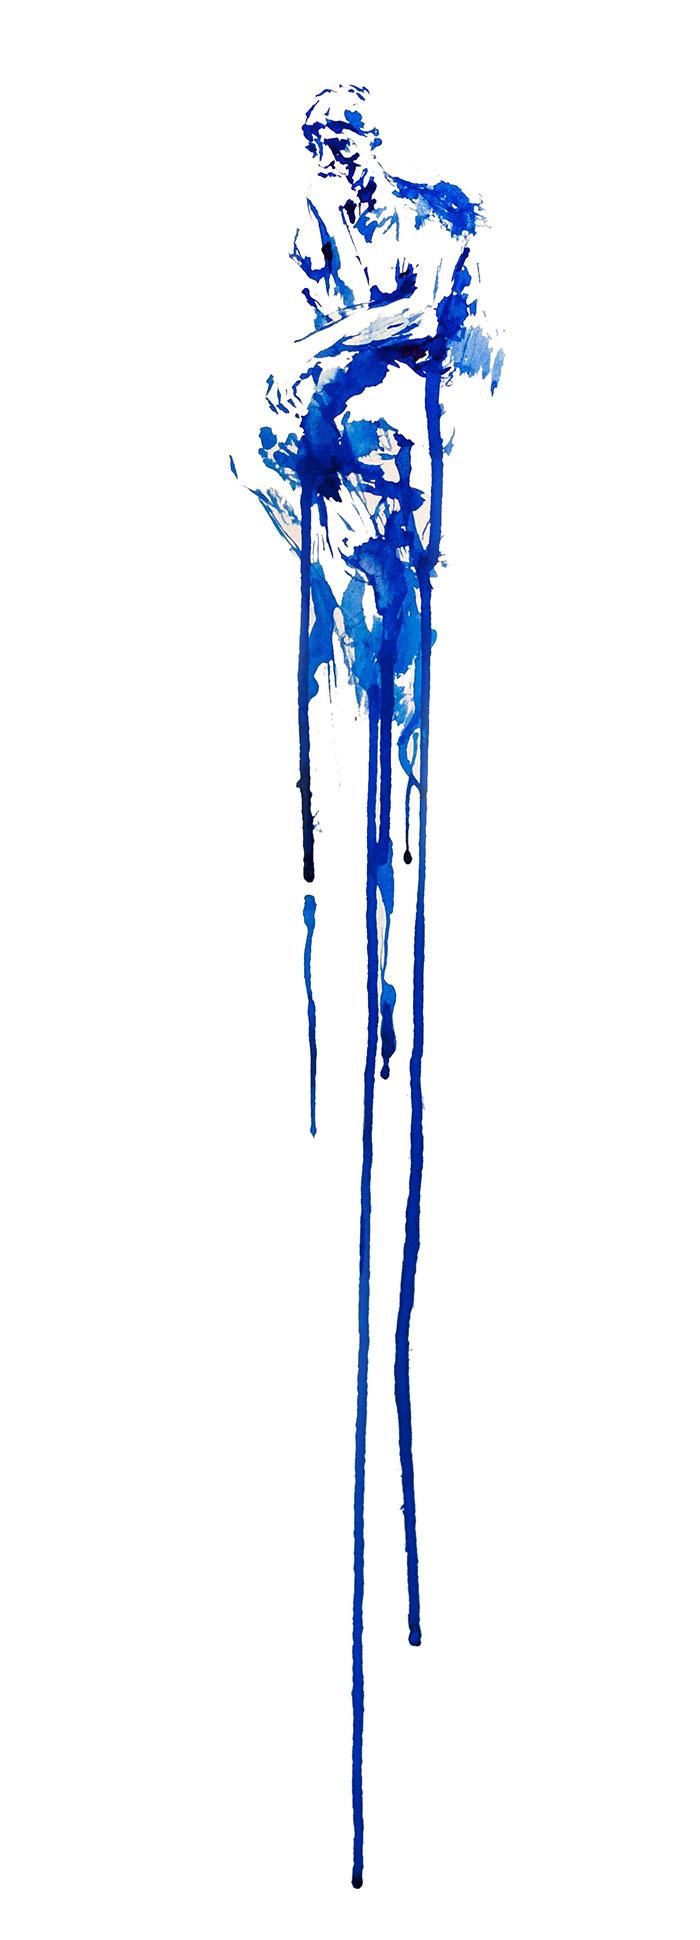 vyvin v malovani (19)